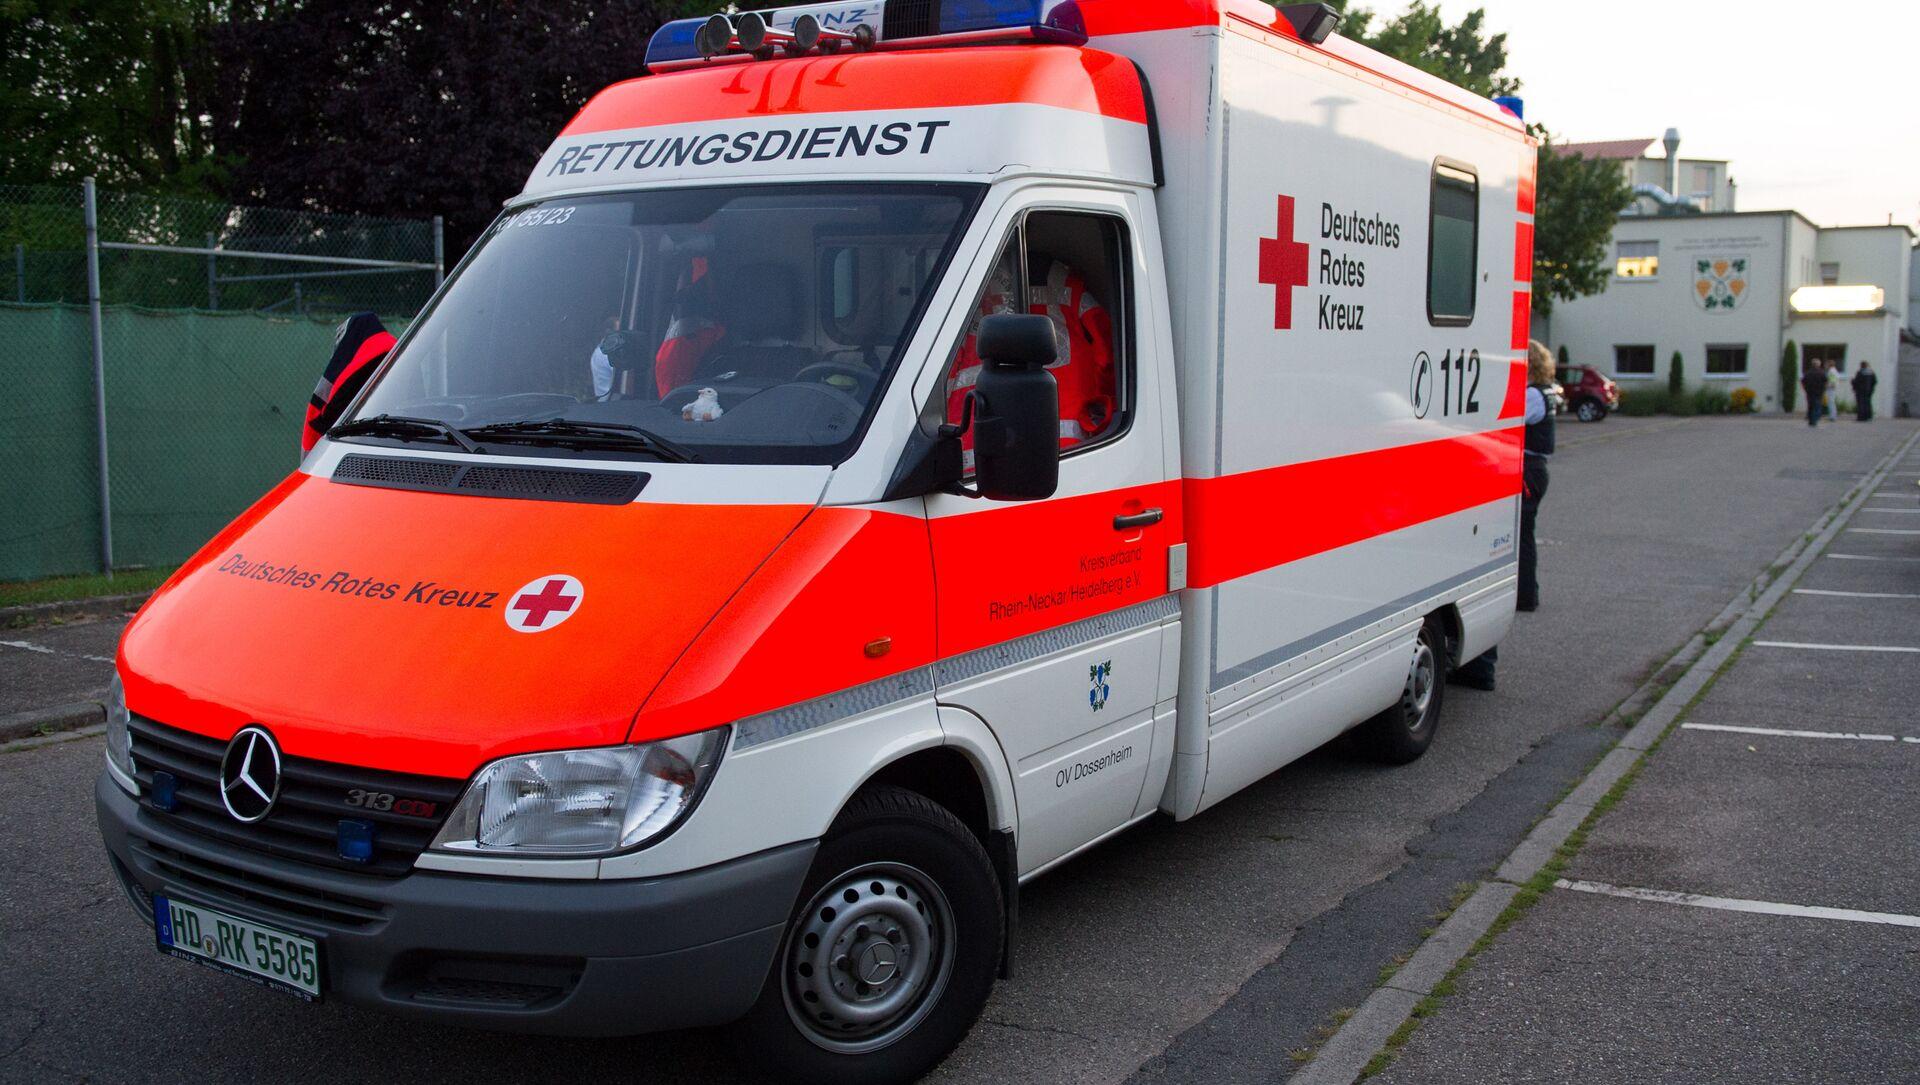 Germany ambulance - Sputnik International, 1920, 30.07.2021